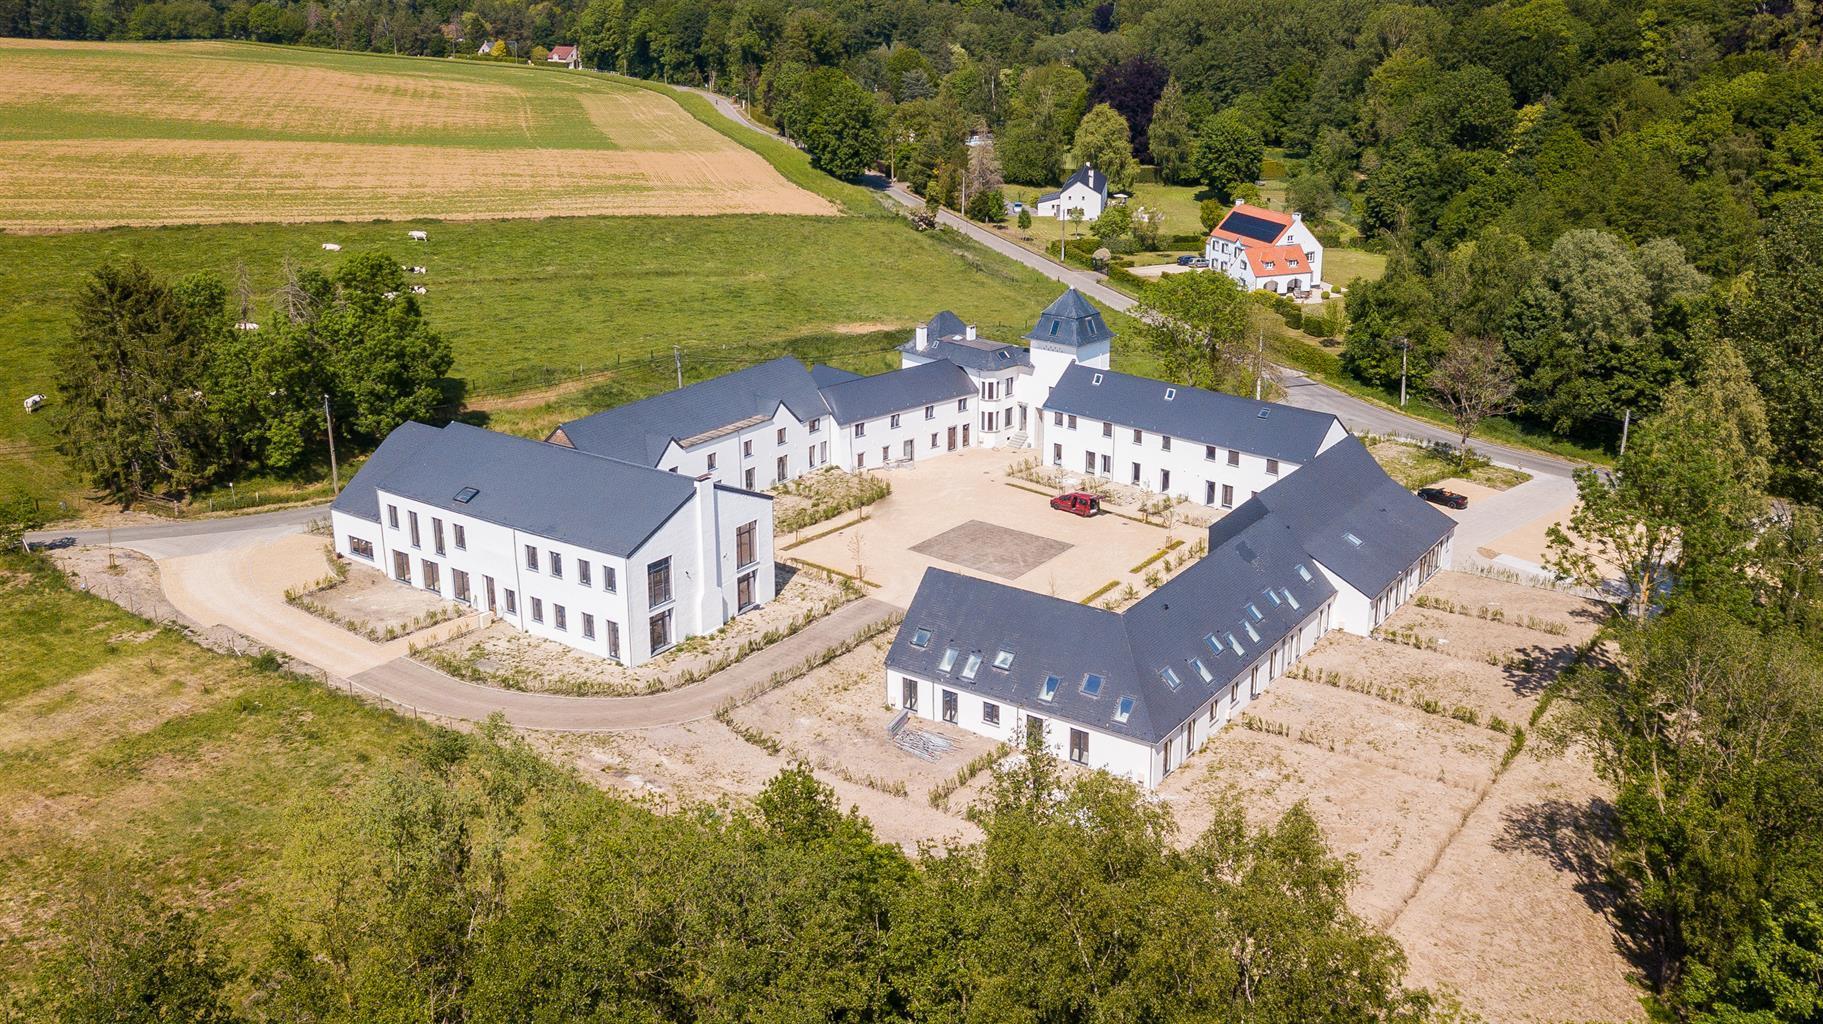 Maison - Genappe Bousval - #4074823-4